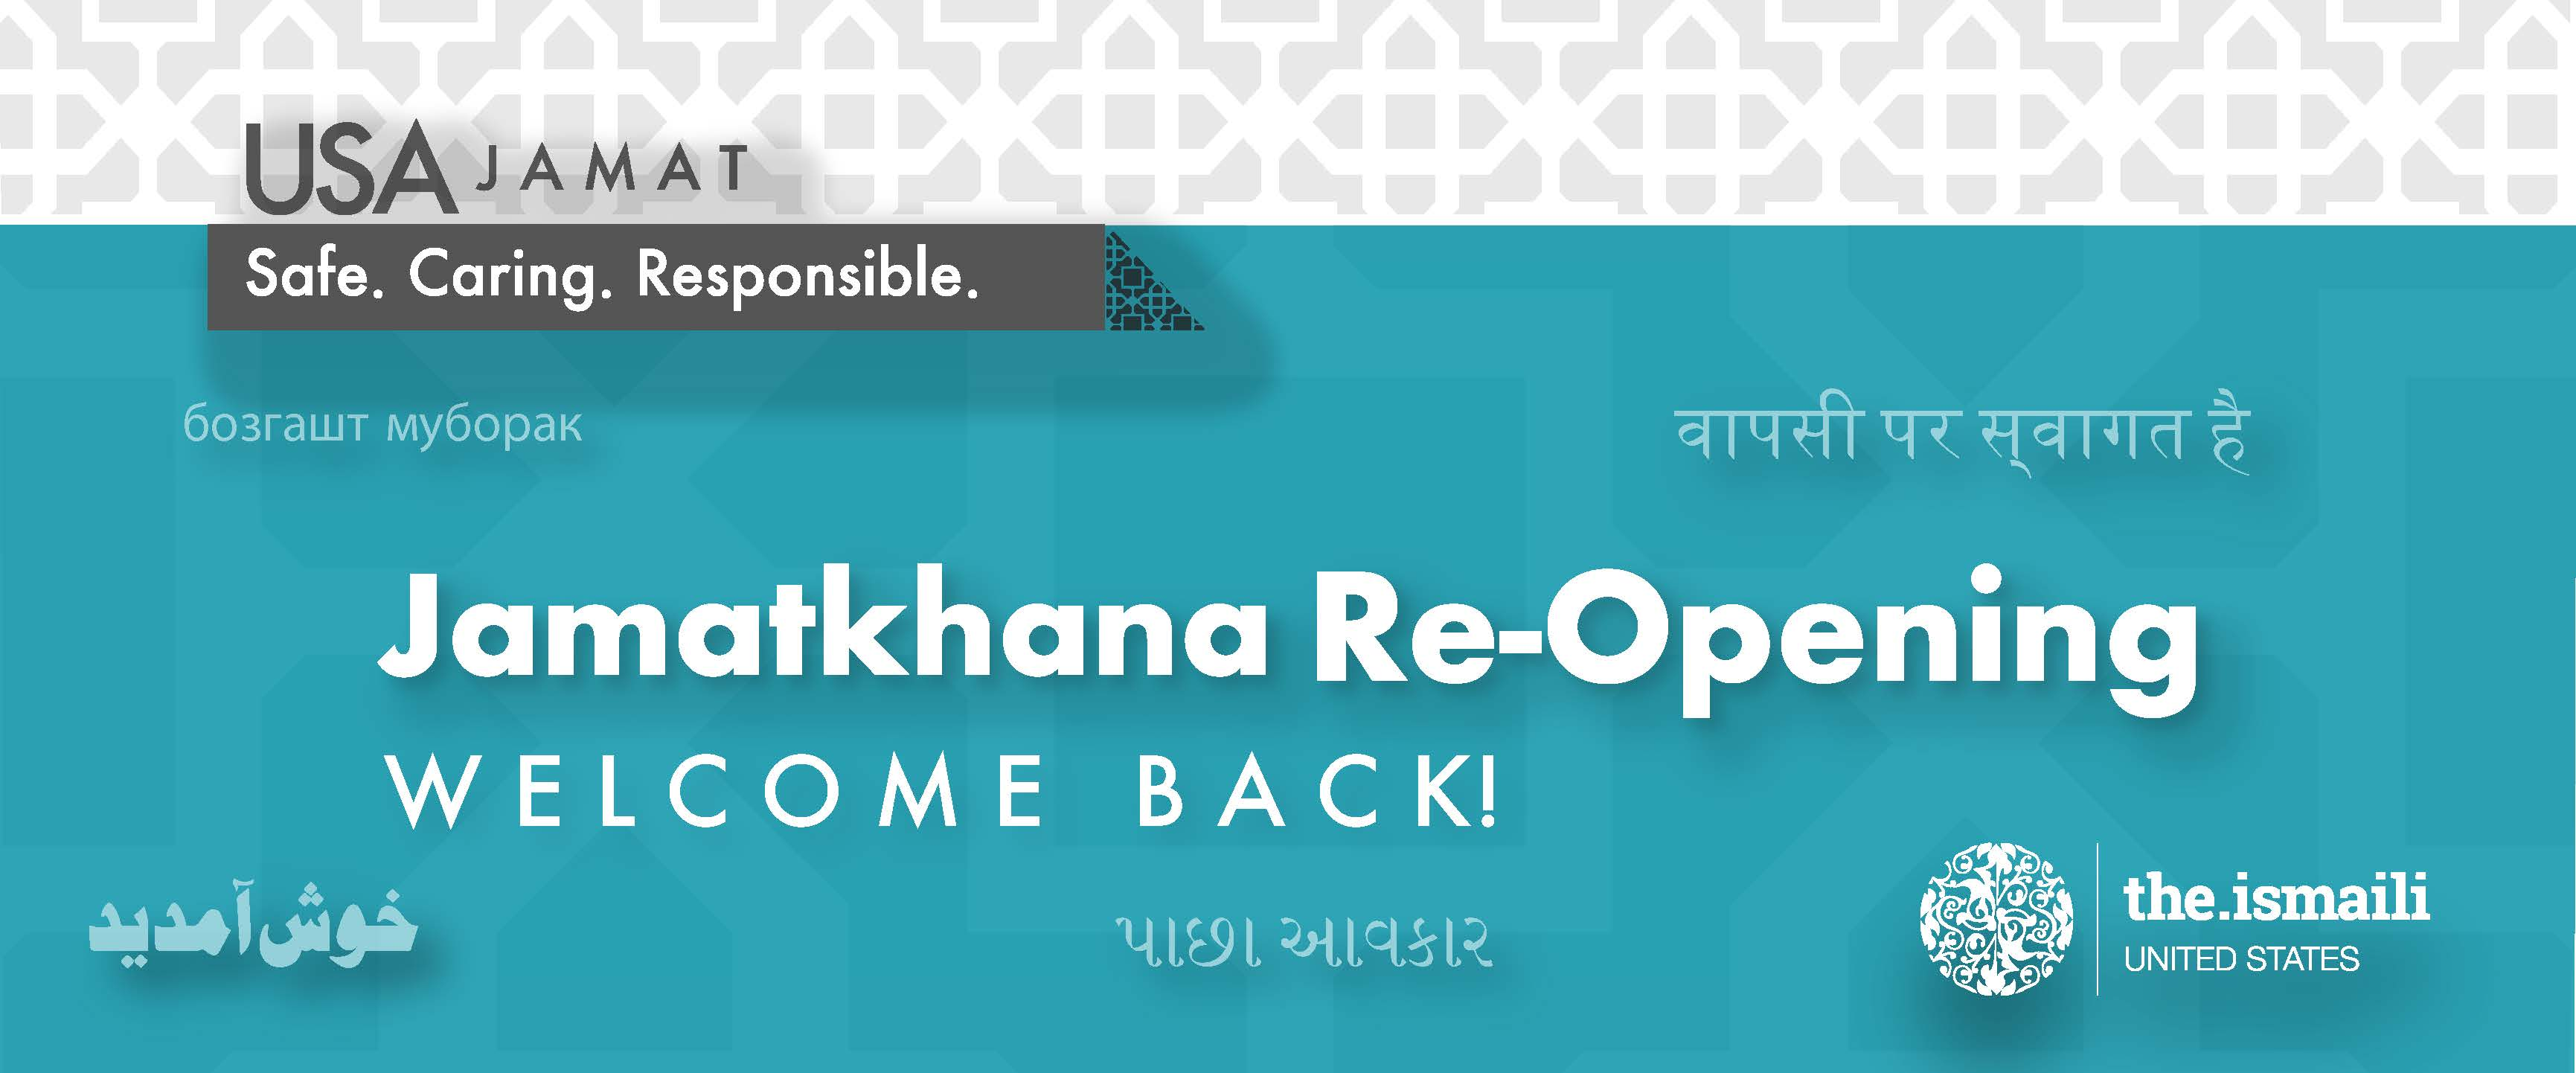 Jamatkhana Re-opening - USA | the.Ismaili